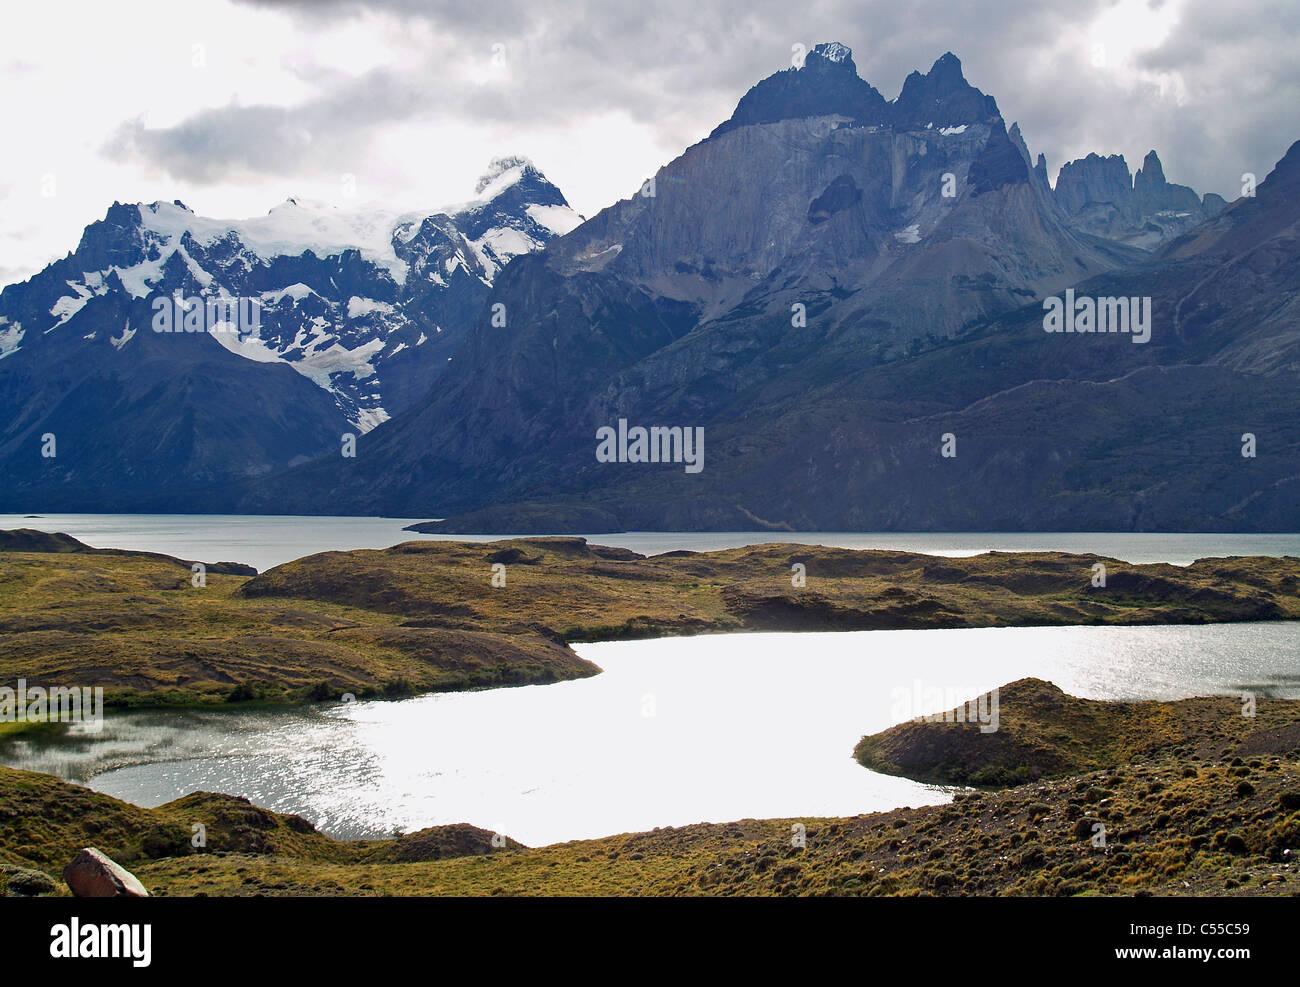 Los Cuernos,Lago Nordenskjold in Torres del Paine, chile - Stock Image